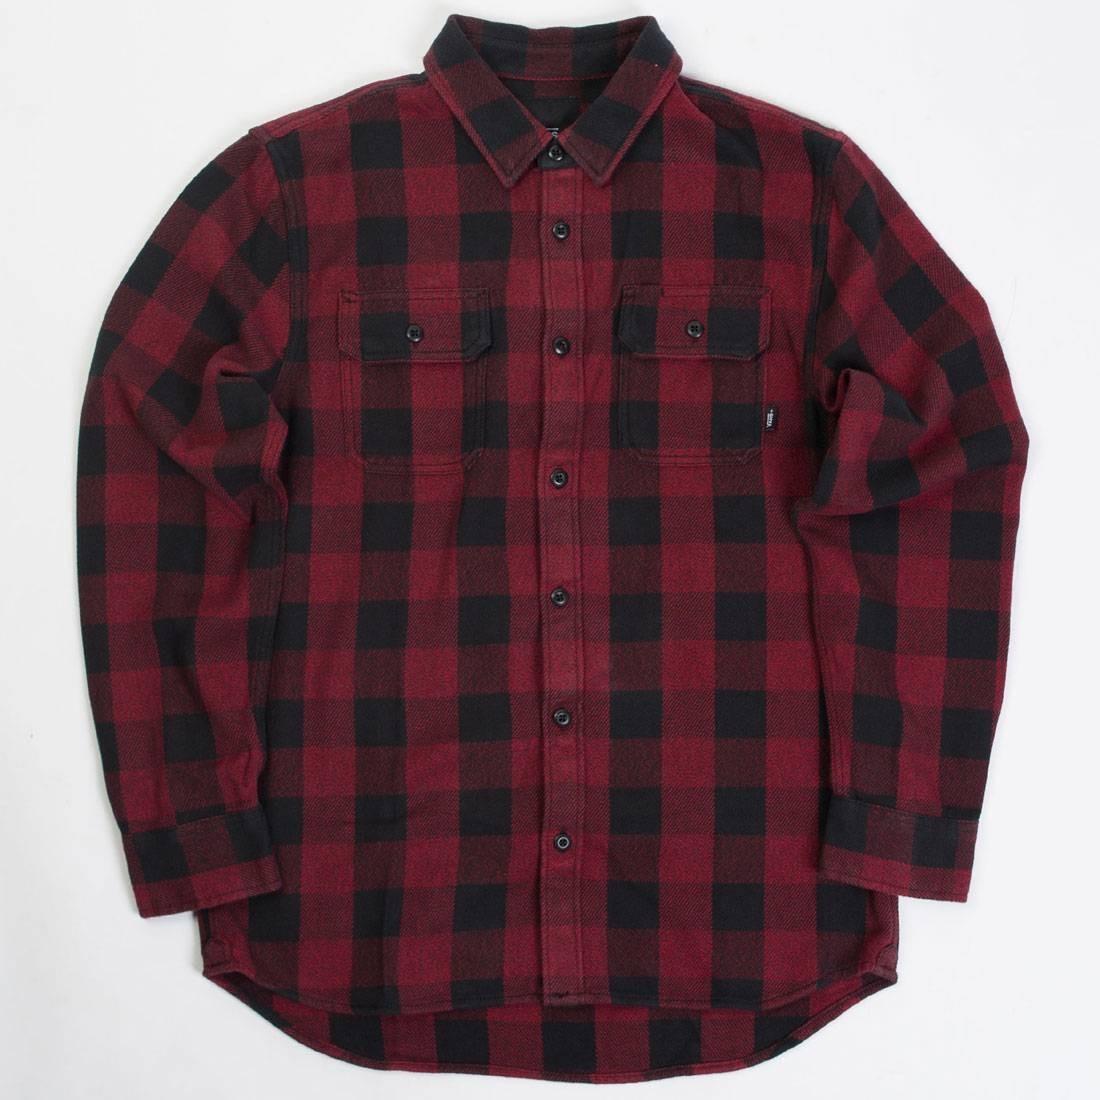 Vans Men Wisner Flannel Shirt (red / chilli pepper)